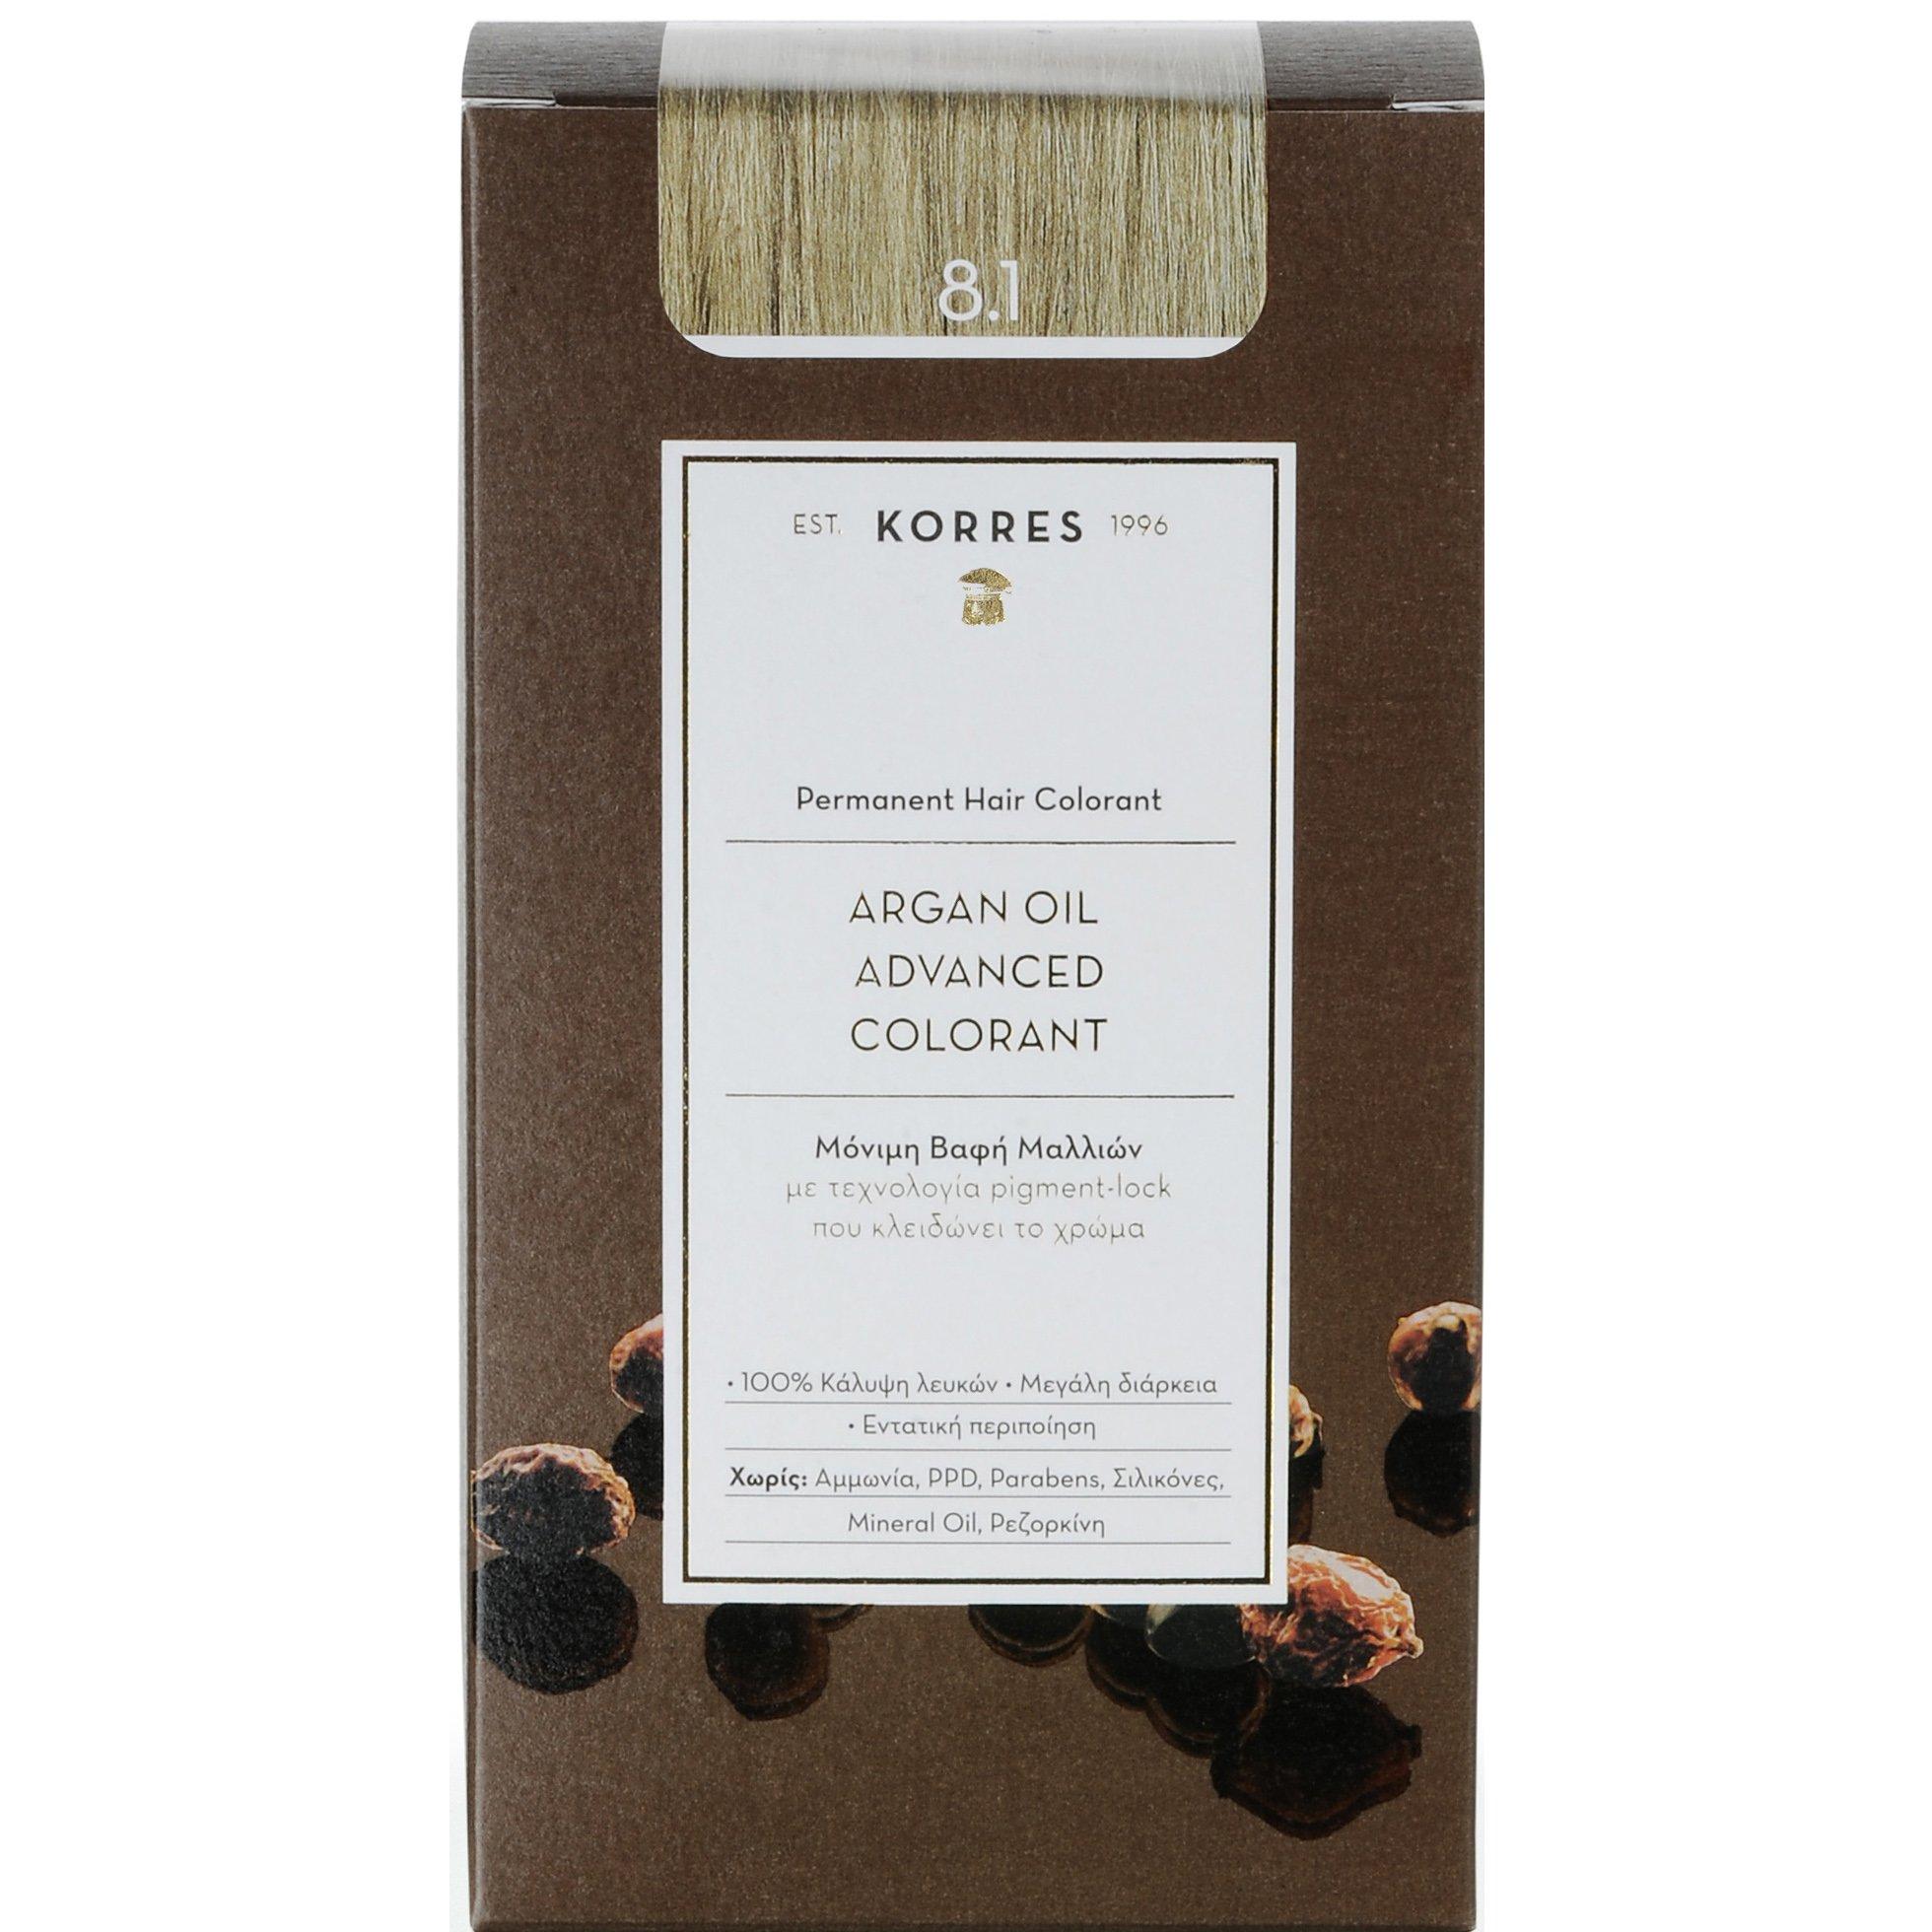 Korres Argan Oil Advanced Colorant Μόνιμη Βαφή Μαλλιών με Τεχνολογία Pigment-Lock που Κλειδώνει το Χρώμα 50ml – 8.1 ΞΑΝΘΟ ΑΝΟΙΧΤΟ ΣΑΝΤΡΕ